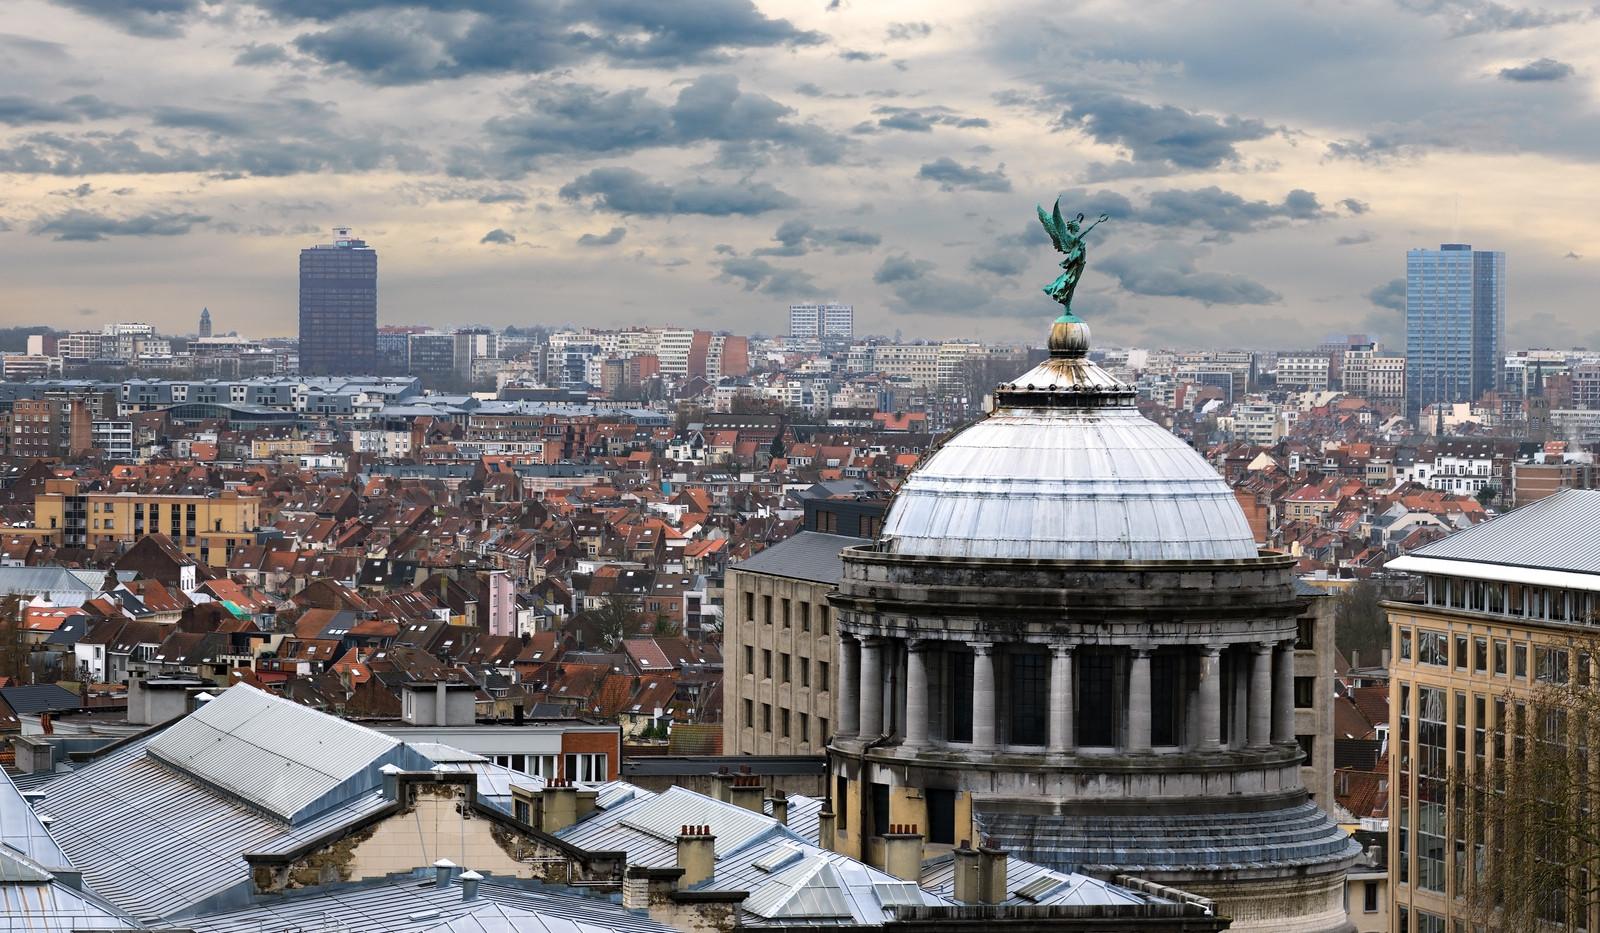 Canva - Aerial view of Brussels, Belgium